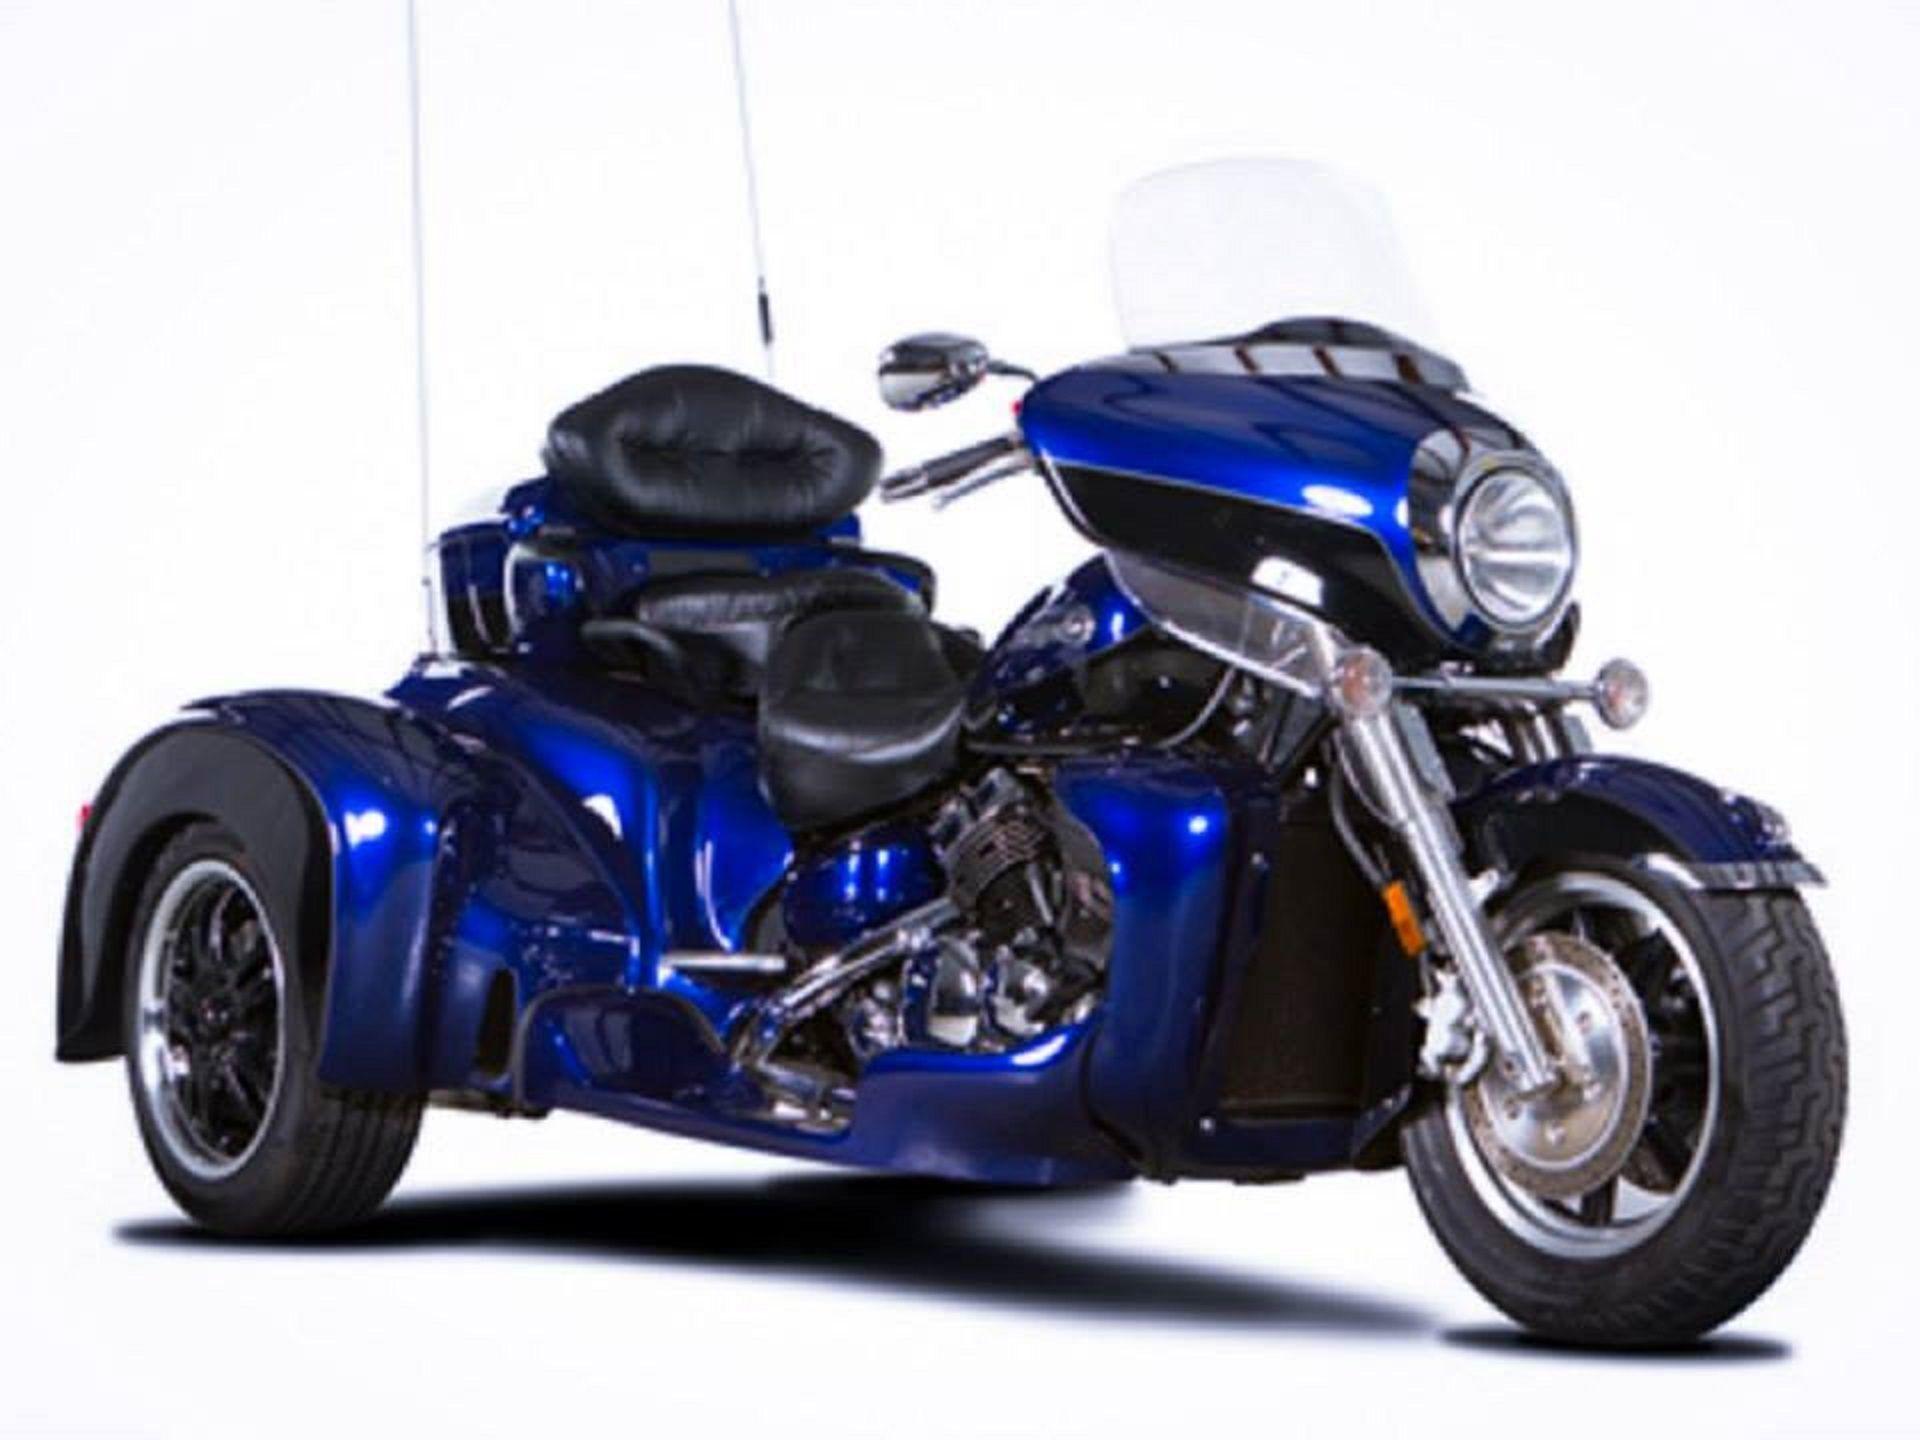 Hannigan's Yamaha Royal Star Venture & Tour Deluxe Trike